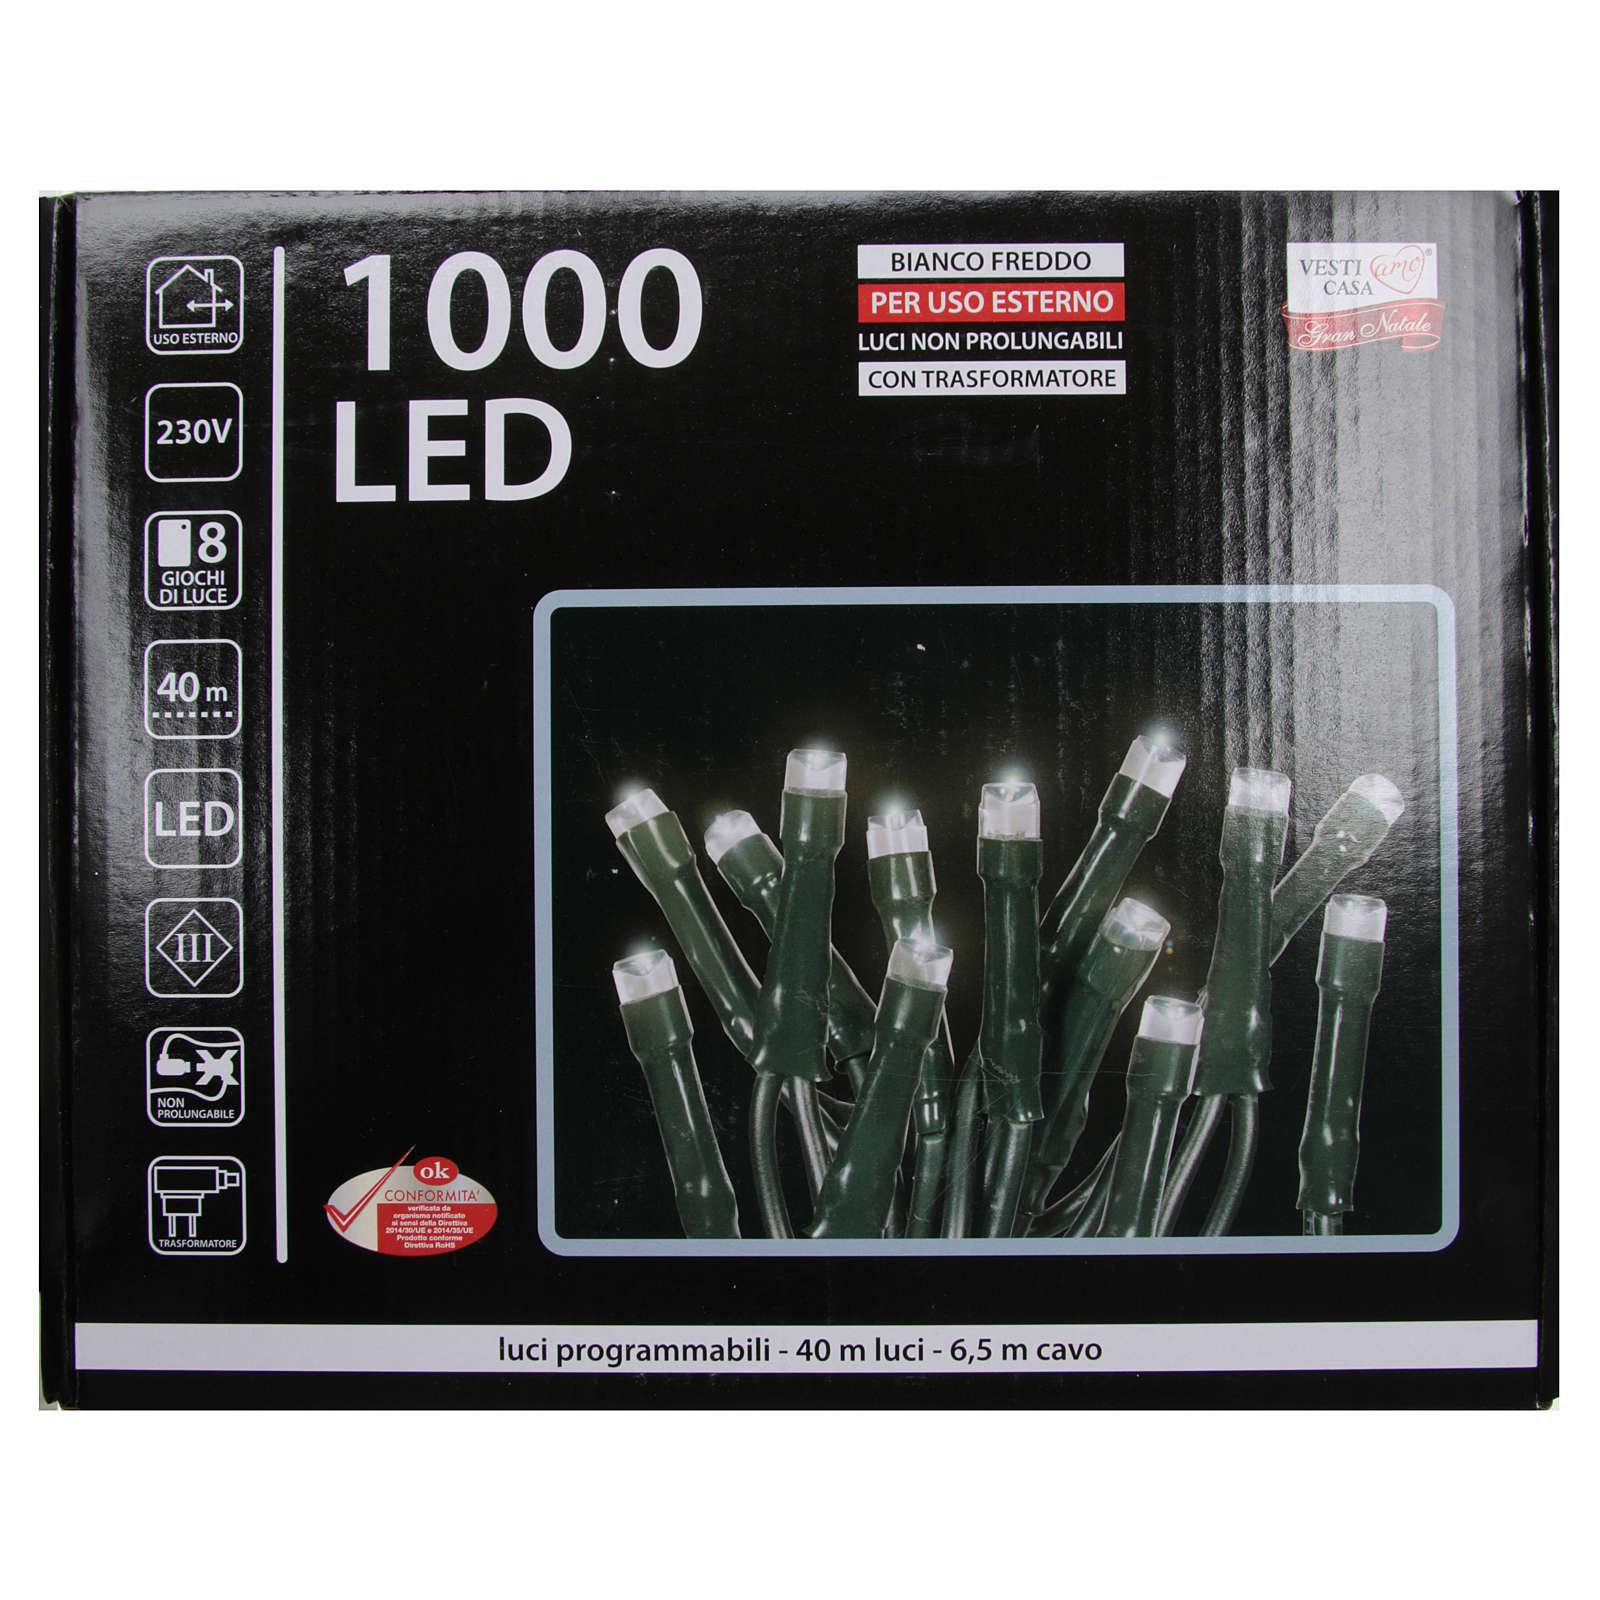 Cadena de luces de Navidad 1000 LED blanco hielo programables para exterior 3